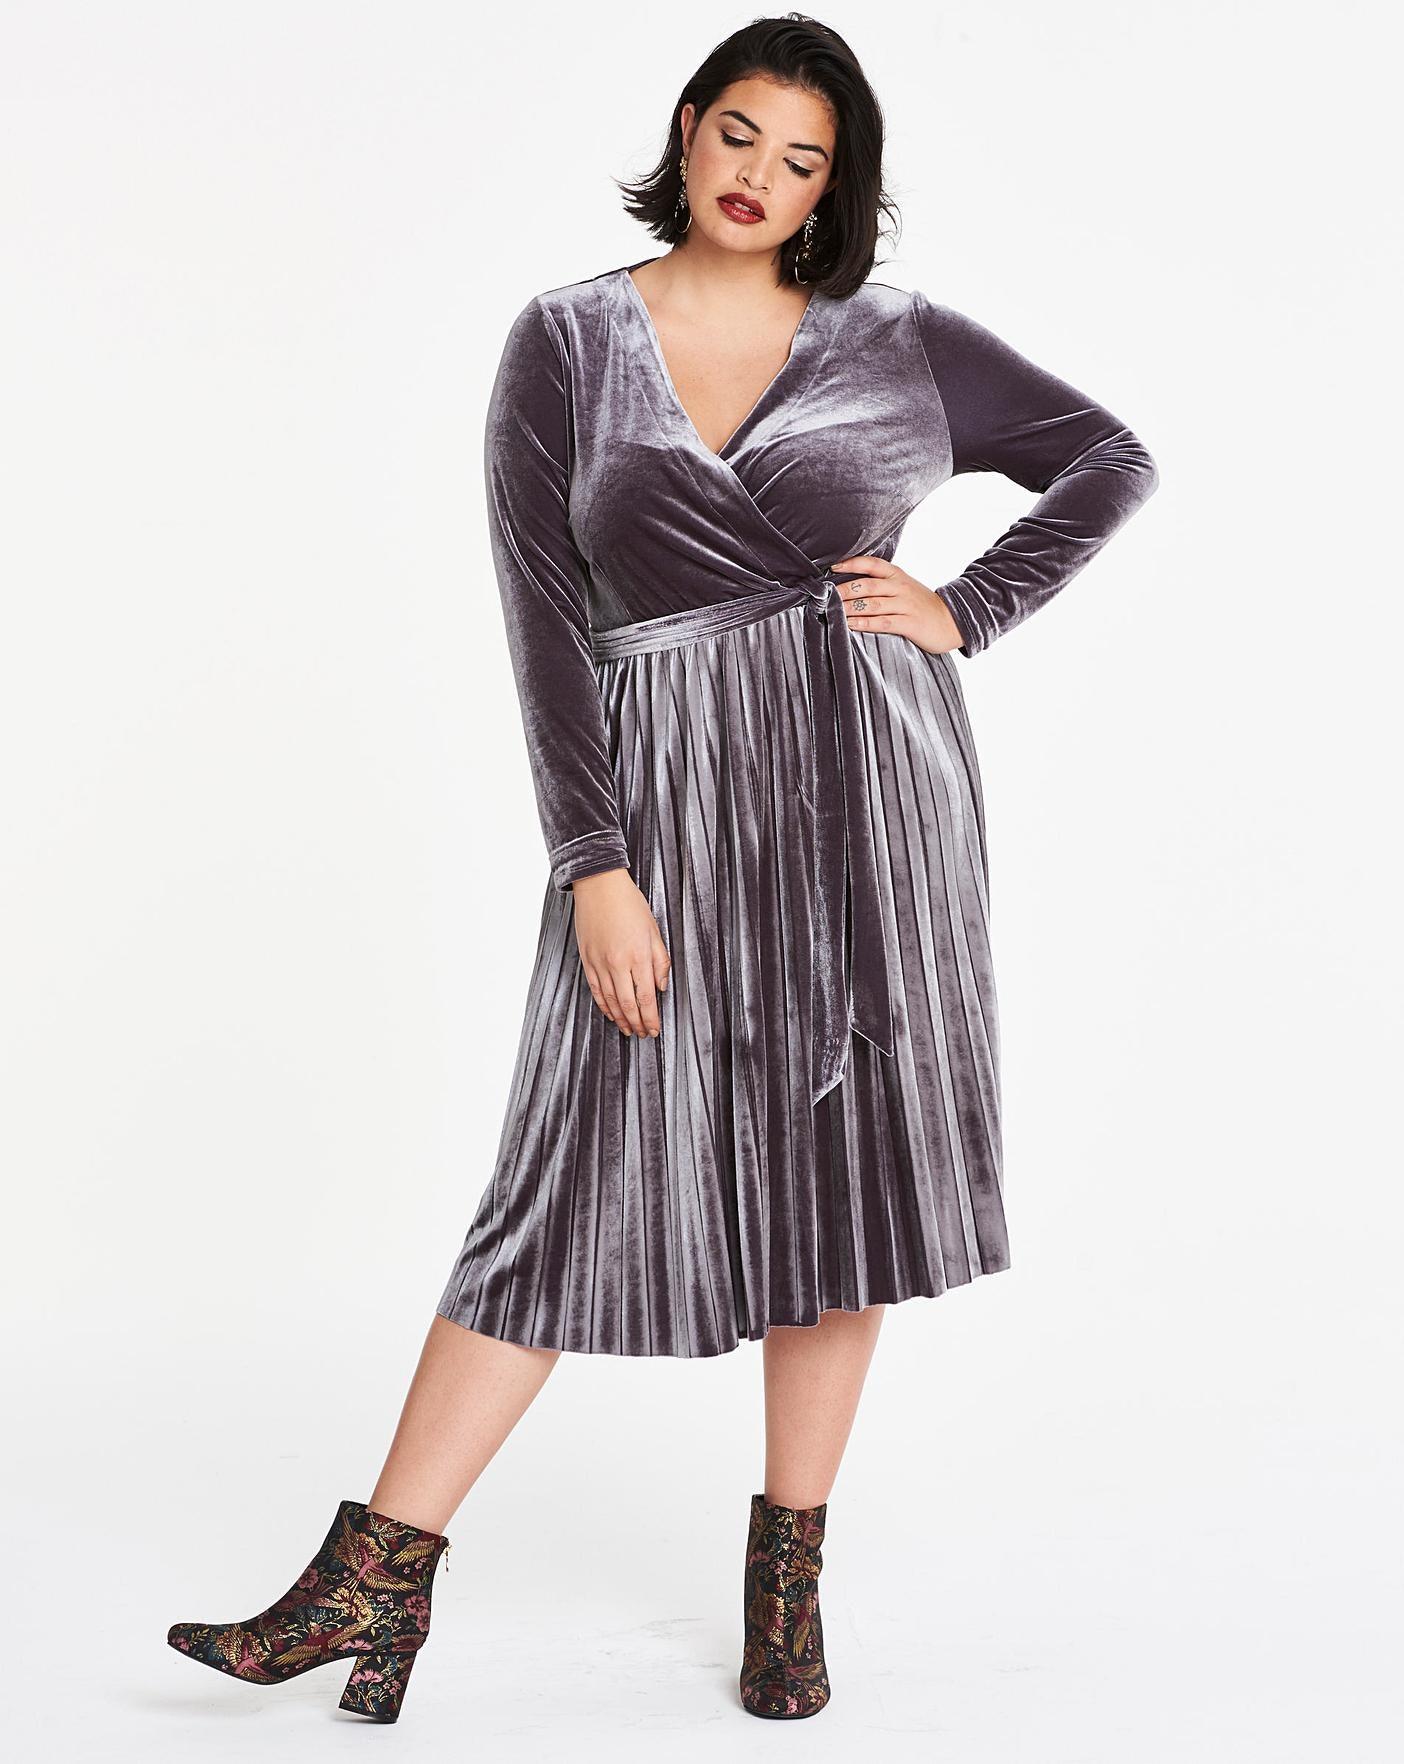 Velvet Dress From The White Company Zara Asos Matches Next